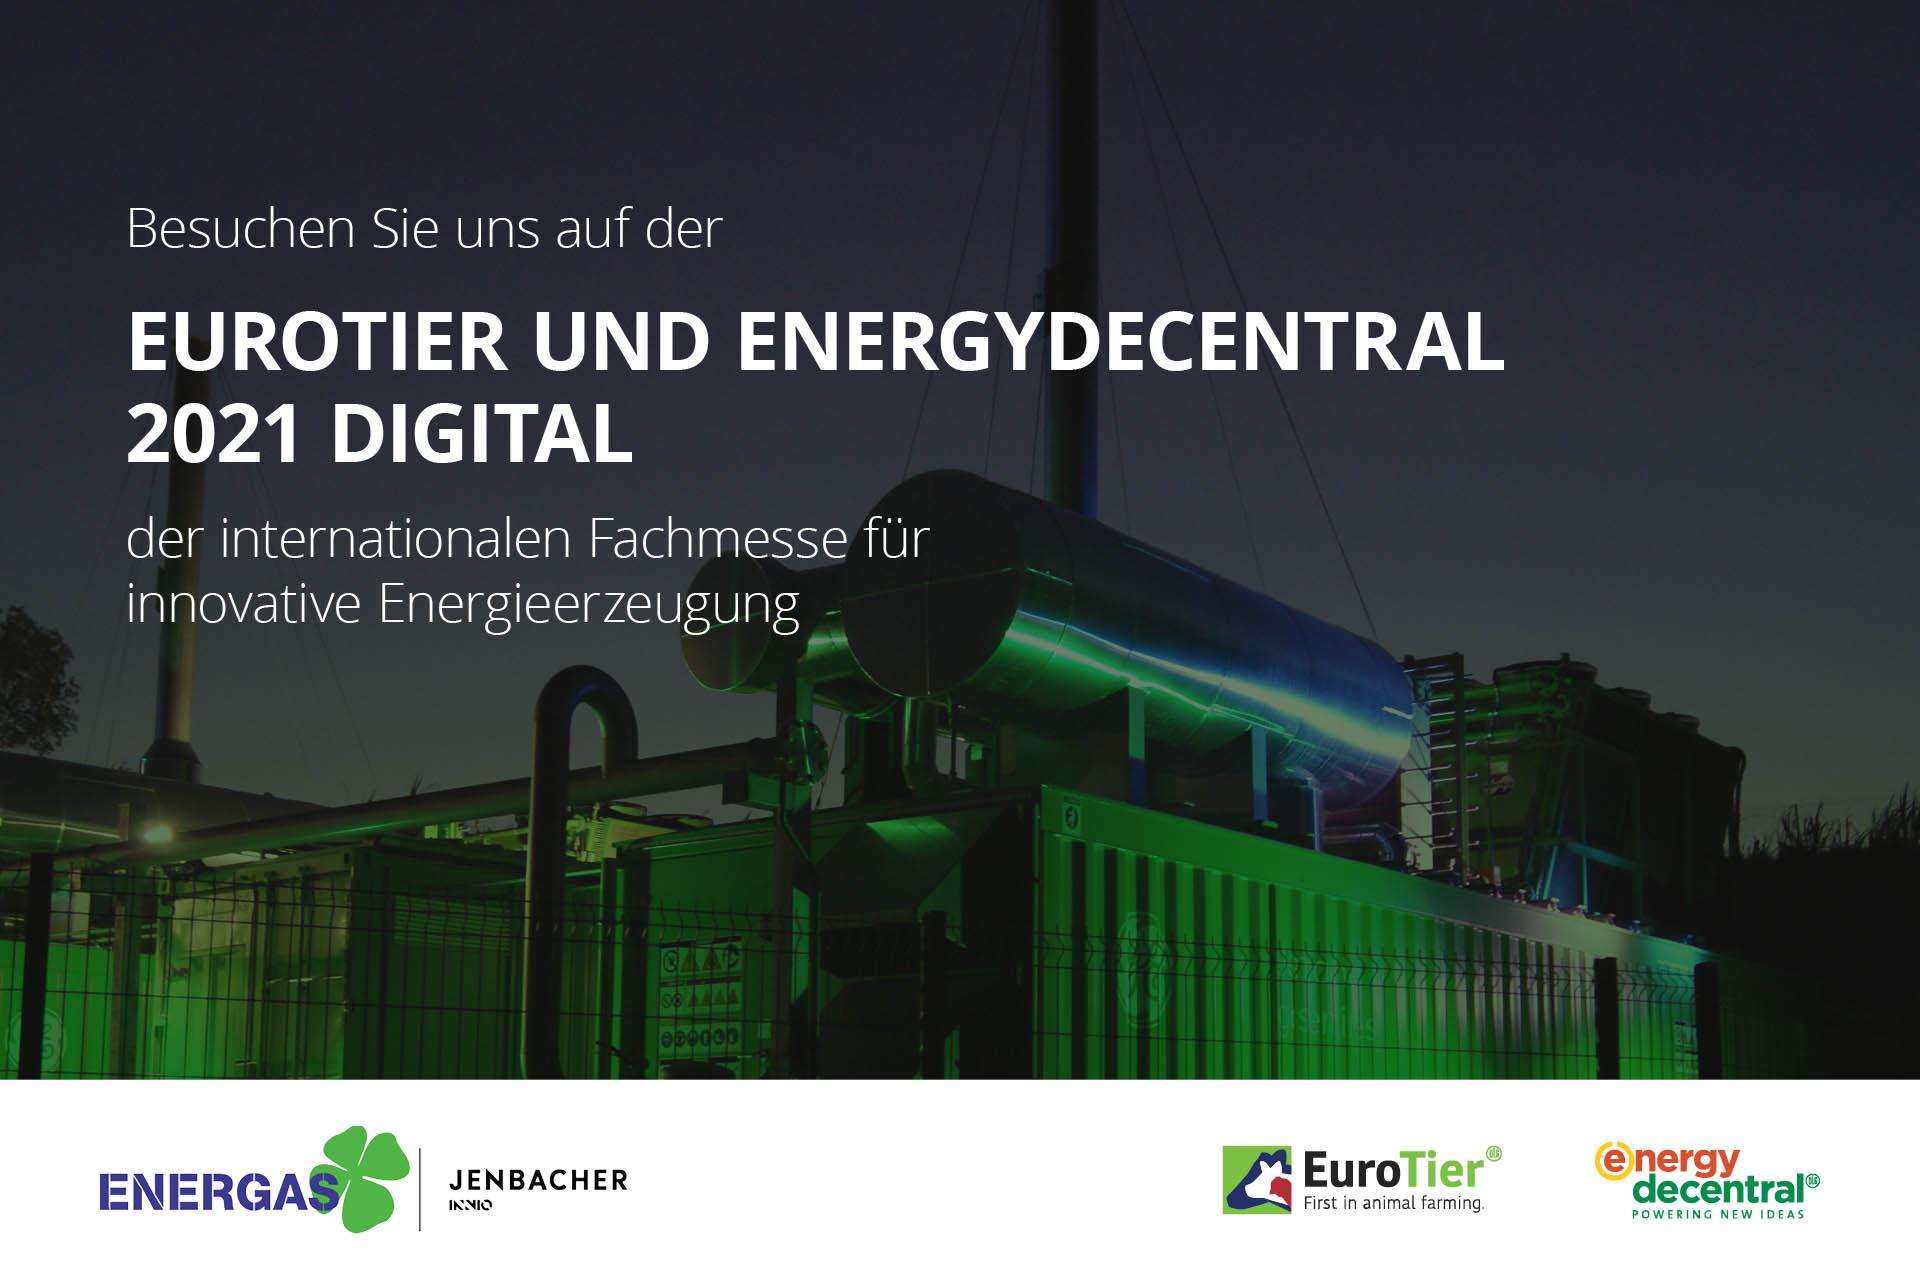 Plakat zu Eurotier und Energydecentral 2021 Digital